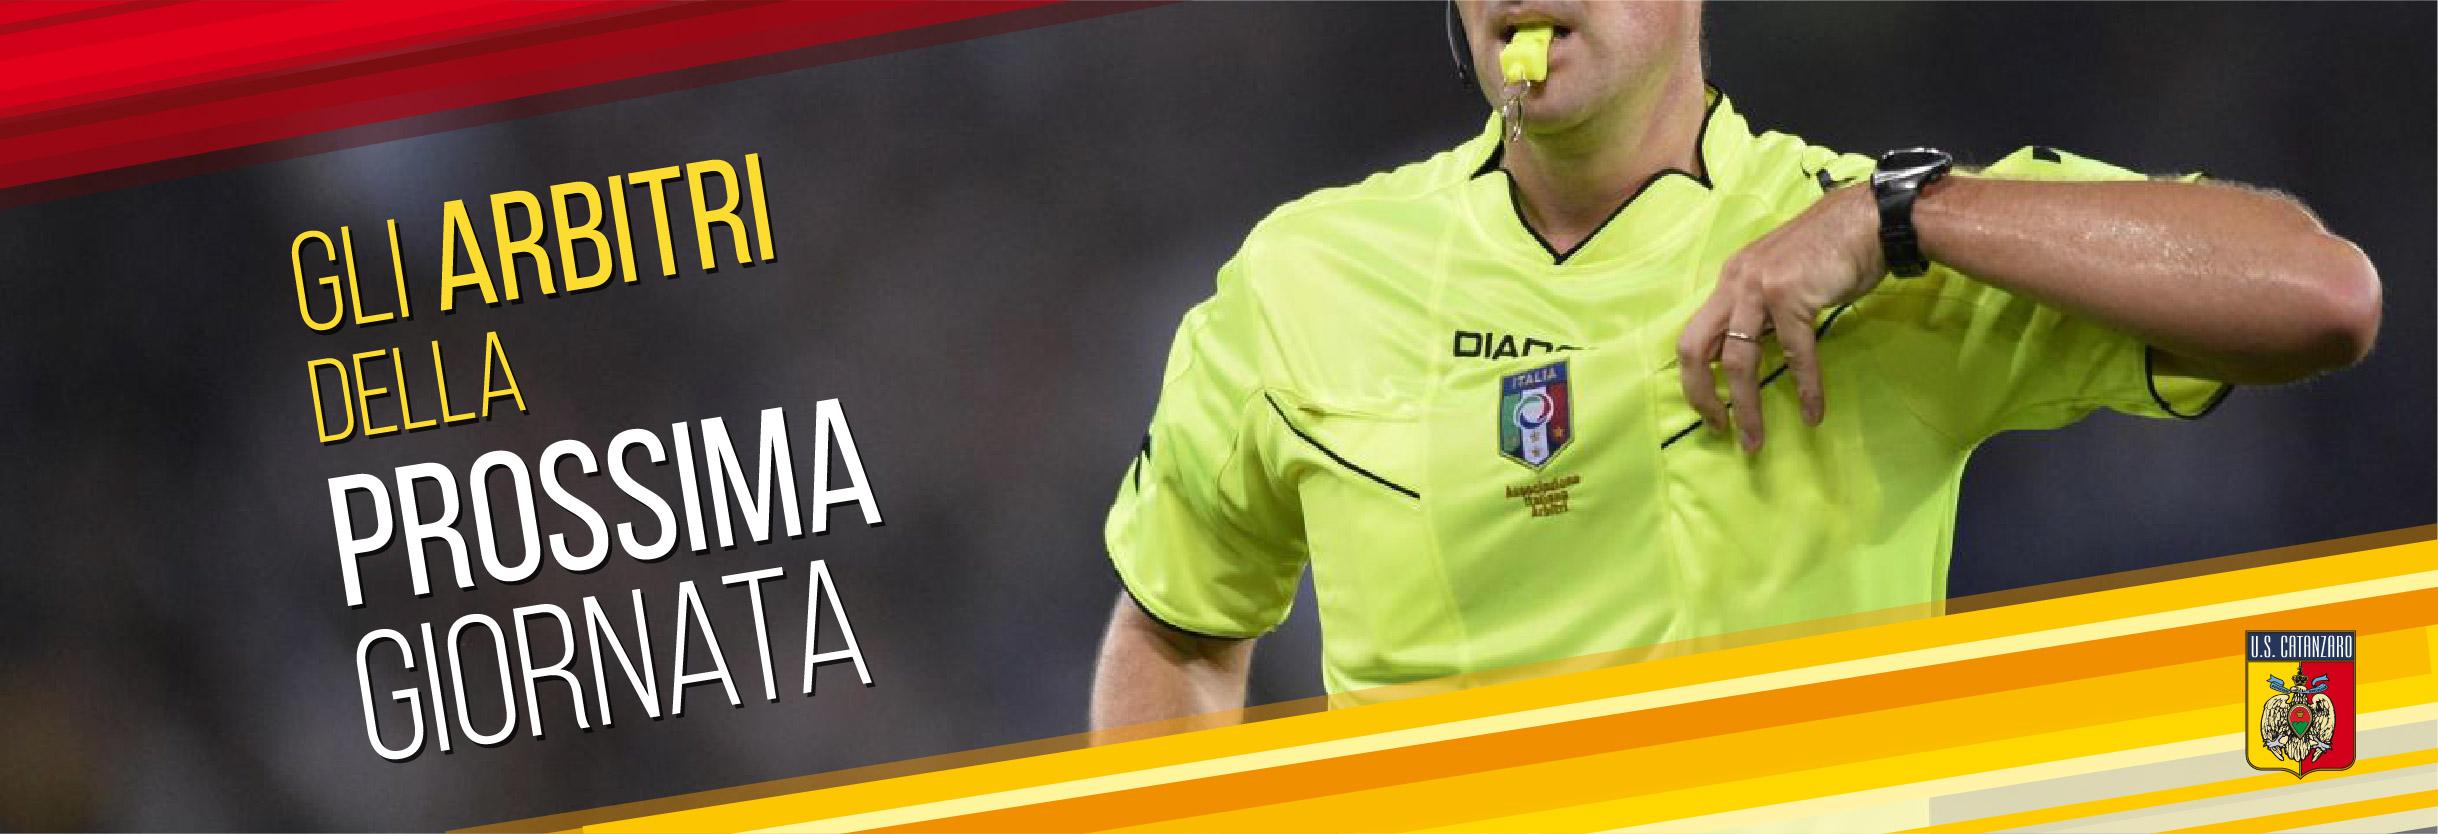 Rende – Catanzaro, arbitro toscano per la gara di venerdì